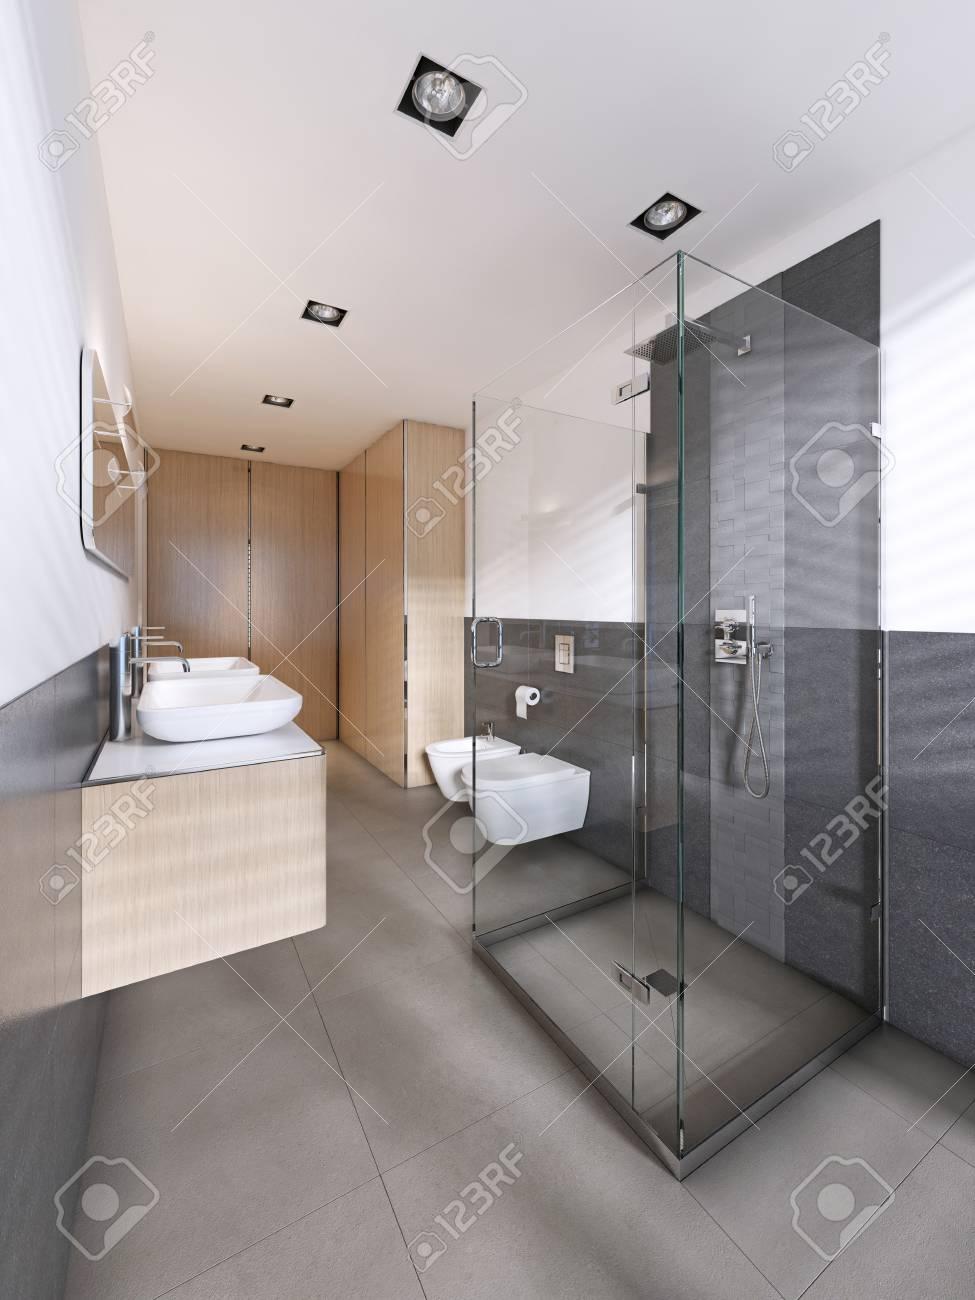 Modern bathroom in scandinavian style with wooden furniture 3d rendering stock photo 113303294